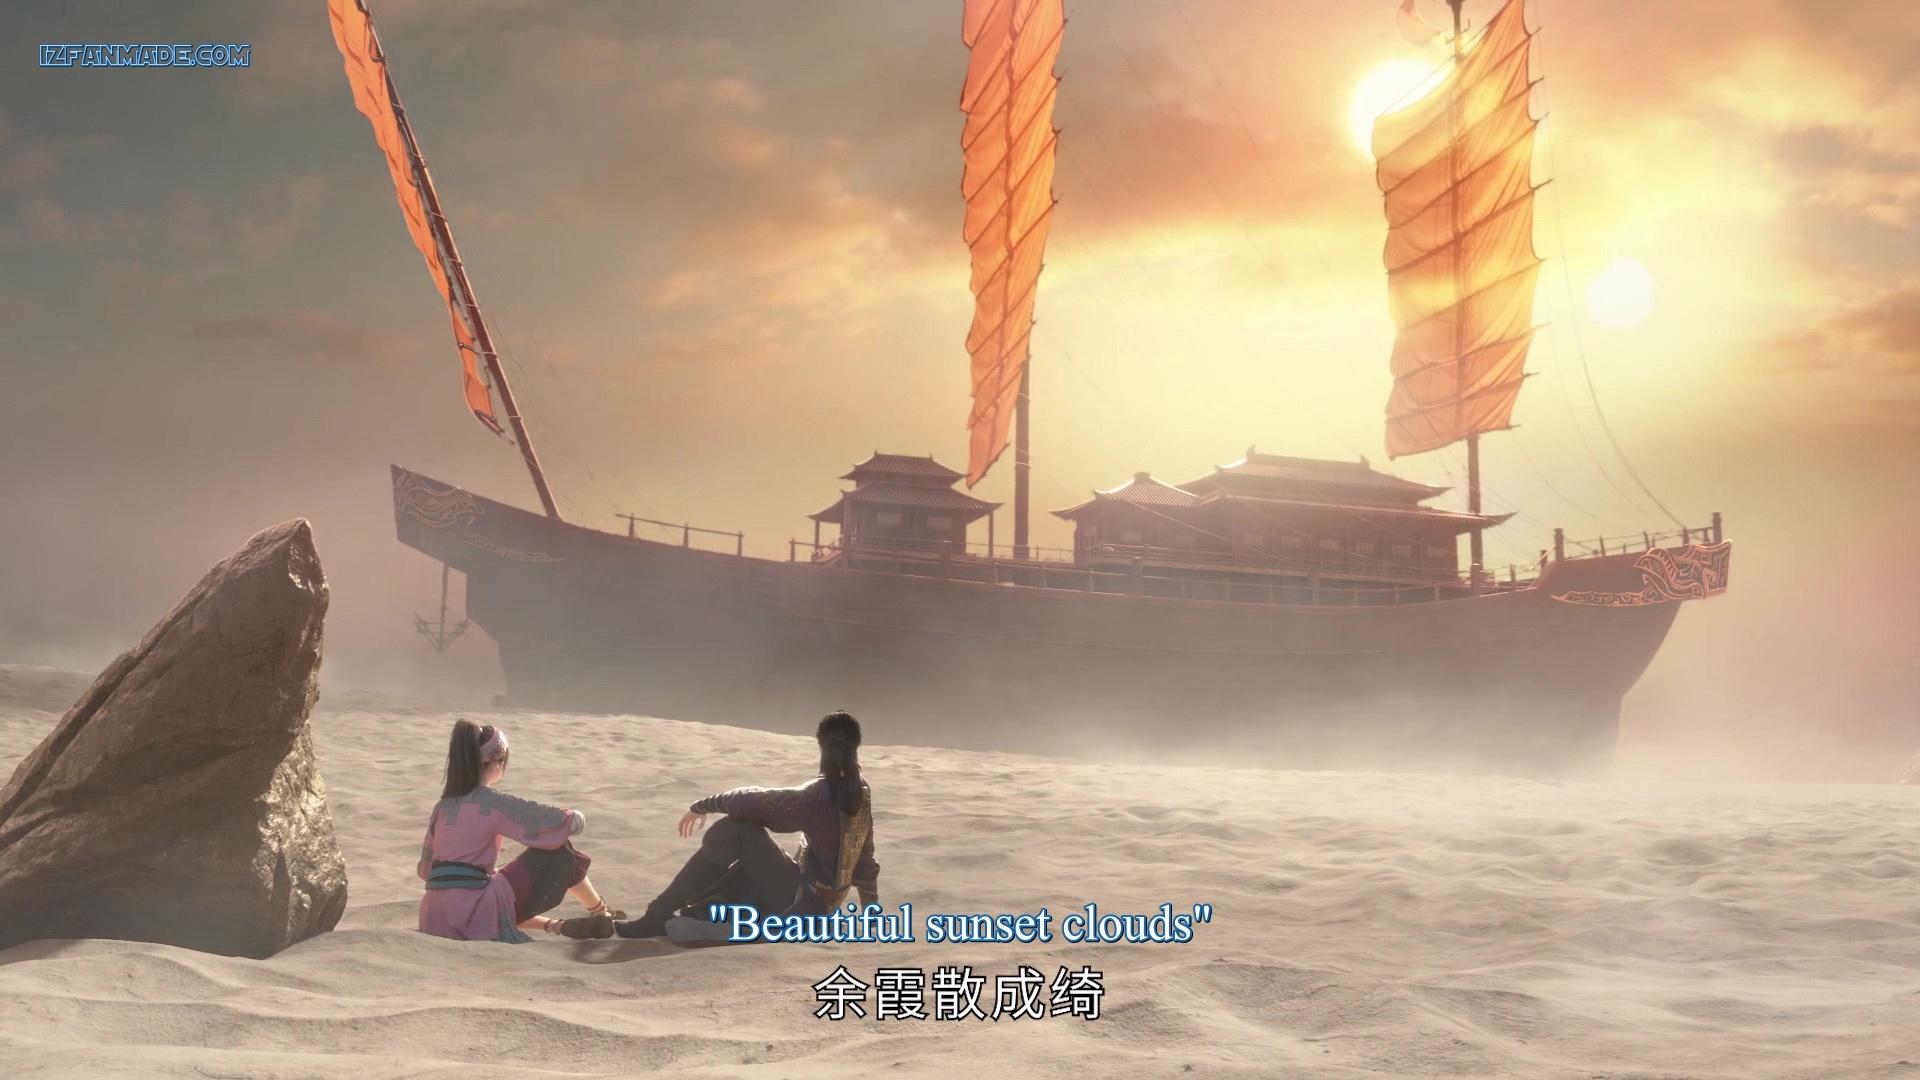 Juan Si Liang - The Island of Siliang episode 07 english sub